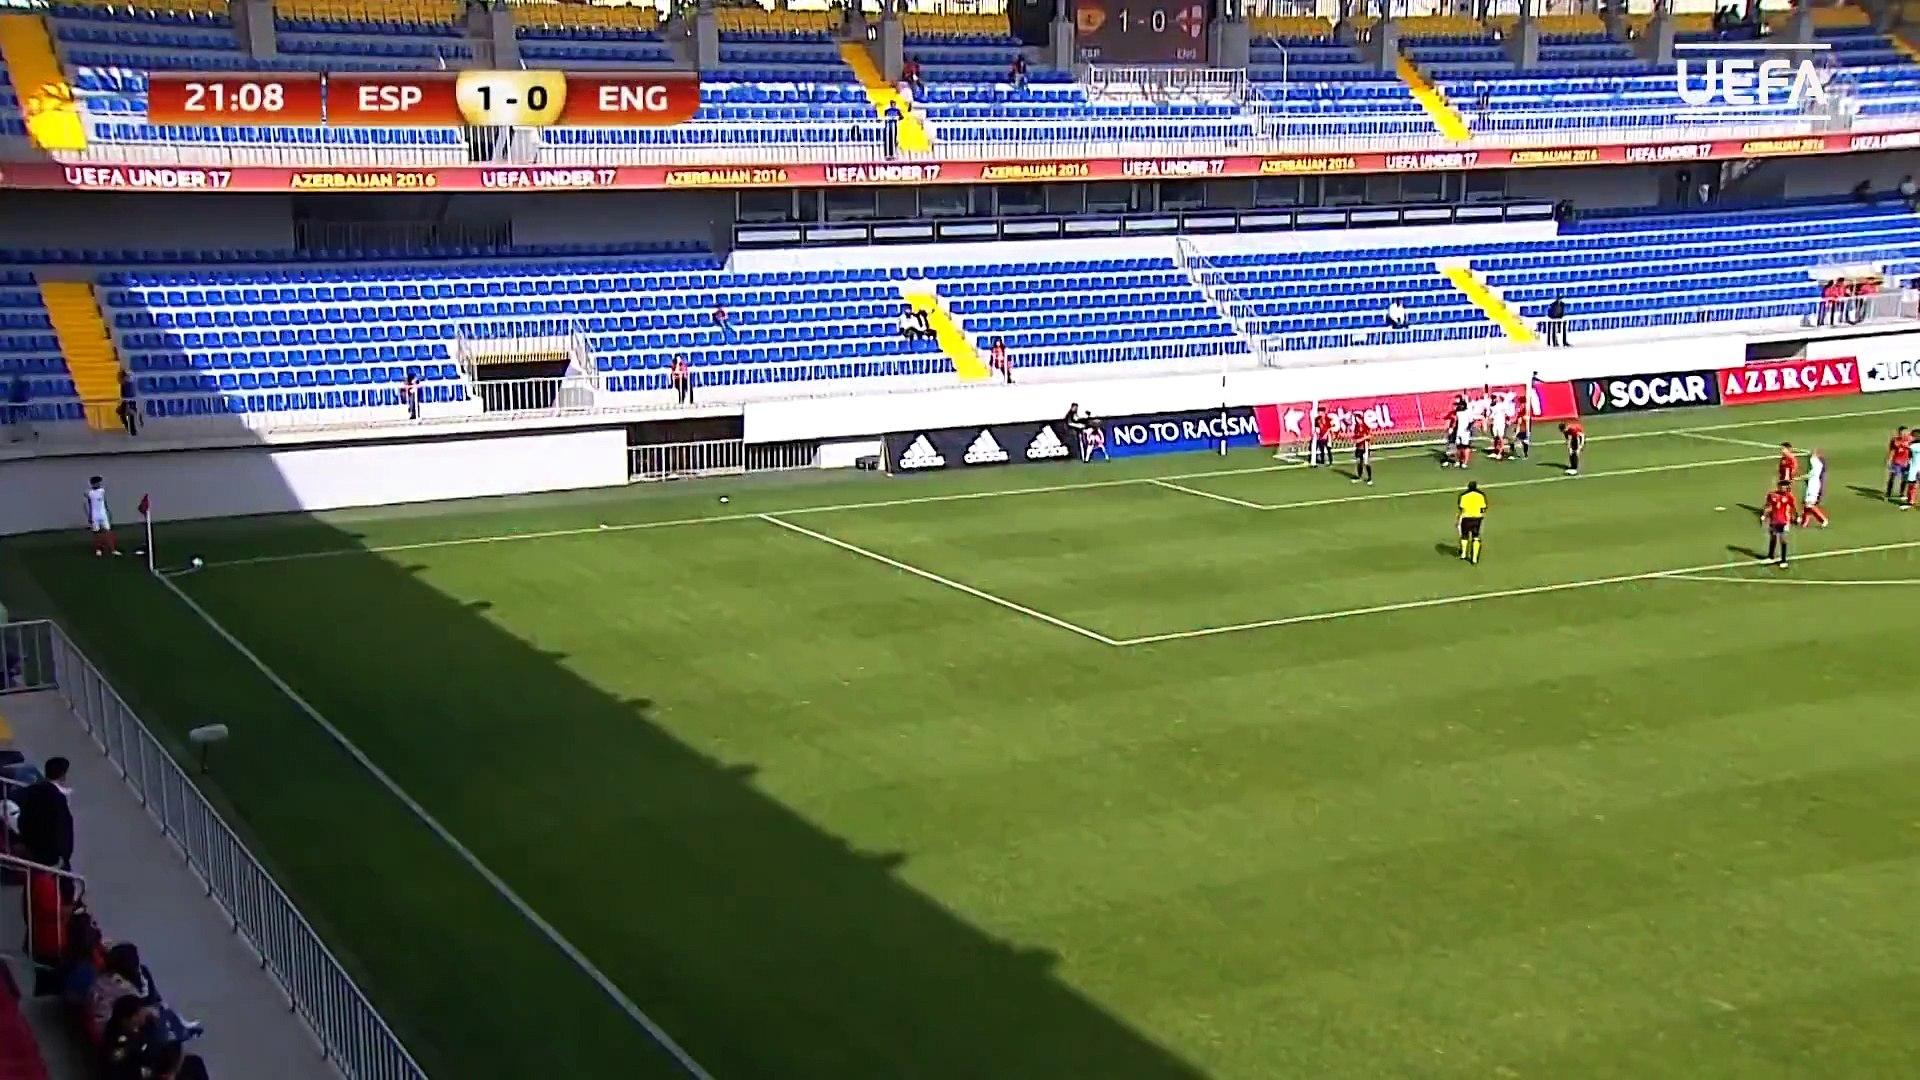 UEFA Under-17 Highlights Spain 1-0 England